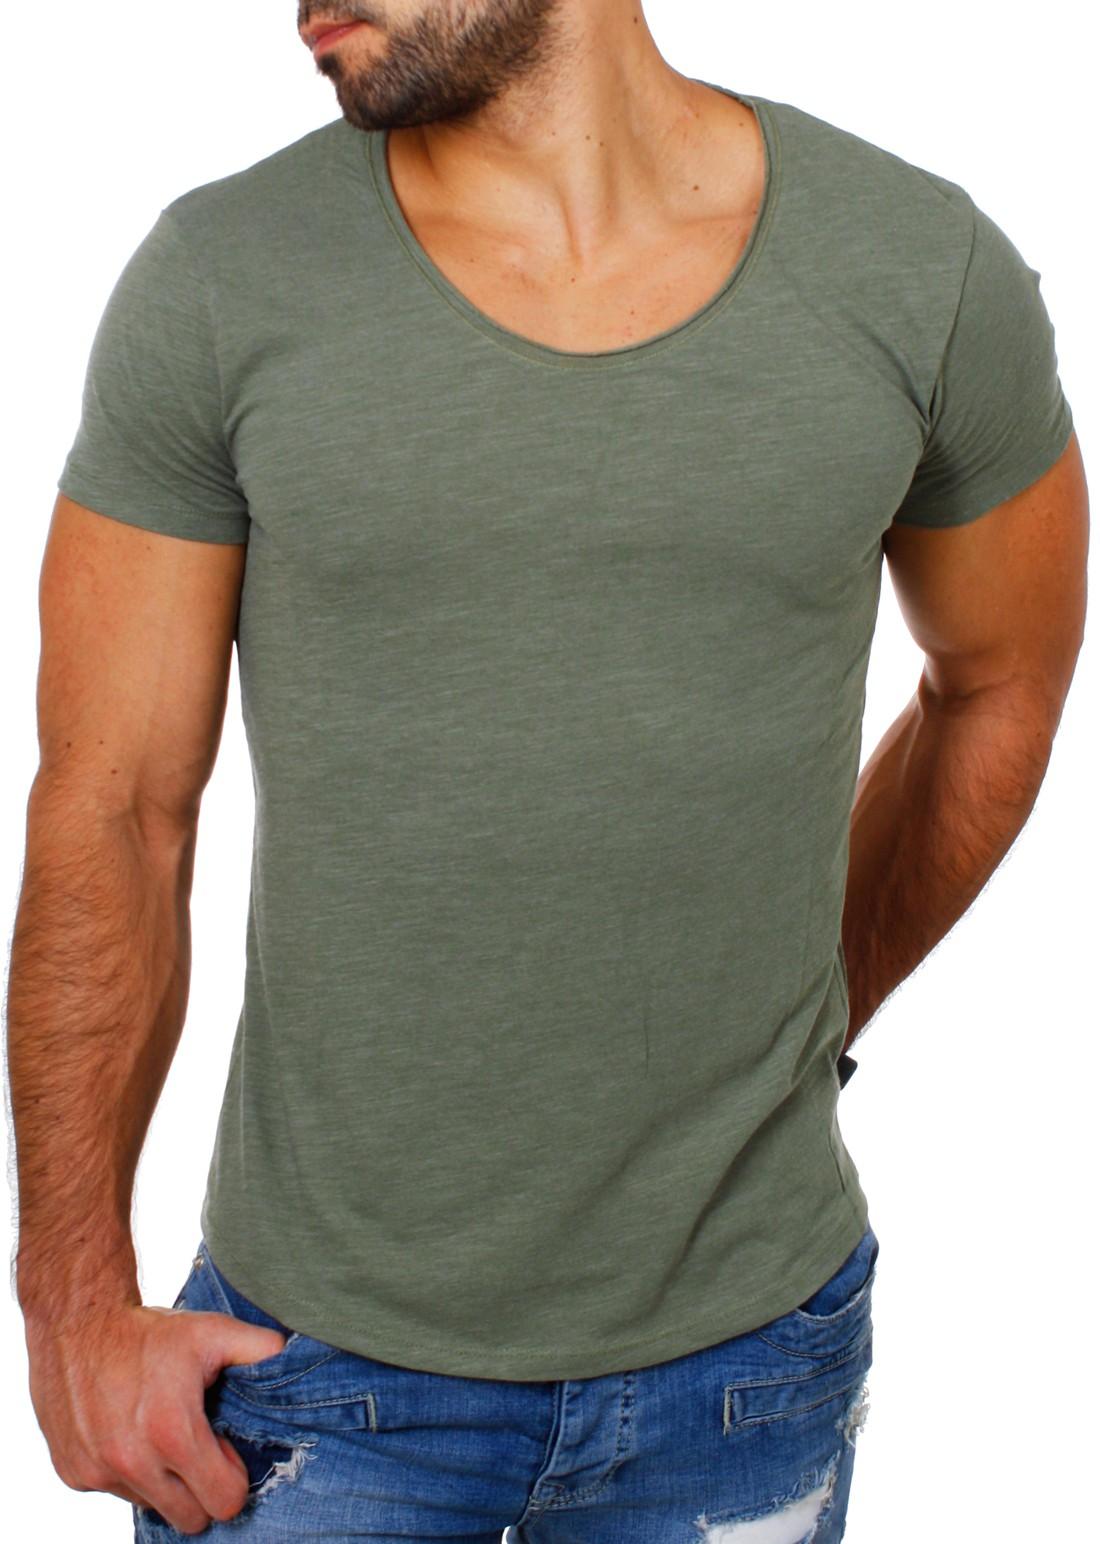 the best attitude 393ee 18ba0 Früchtl Herren Uni Basic T-Shirt tiefer Ausschnitt slimfit ...